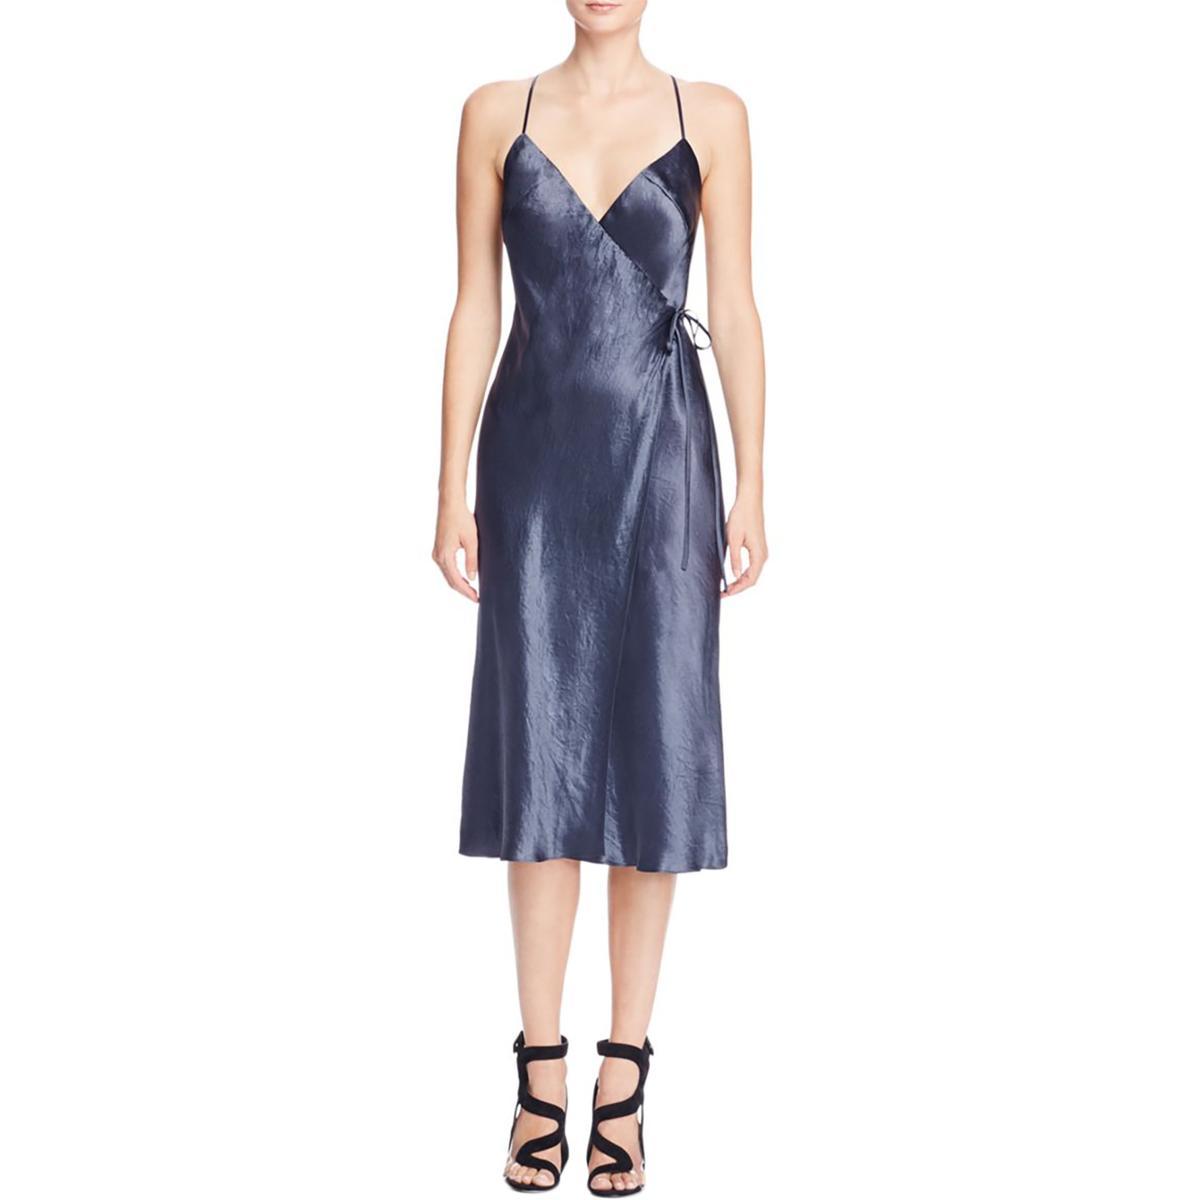 02ce611bc3e3b ABS Collection Womens Navy Satin Wrap Spaghetti Straps Slip Dress 0 ...